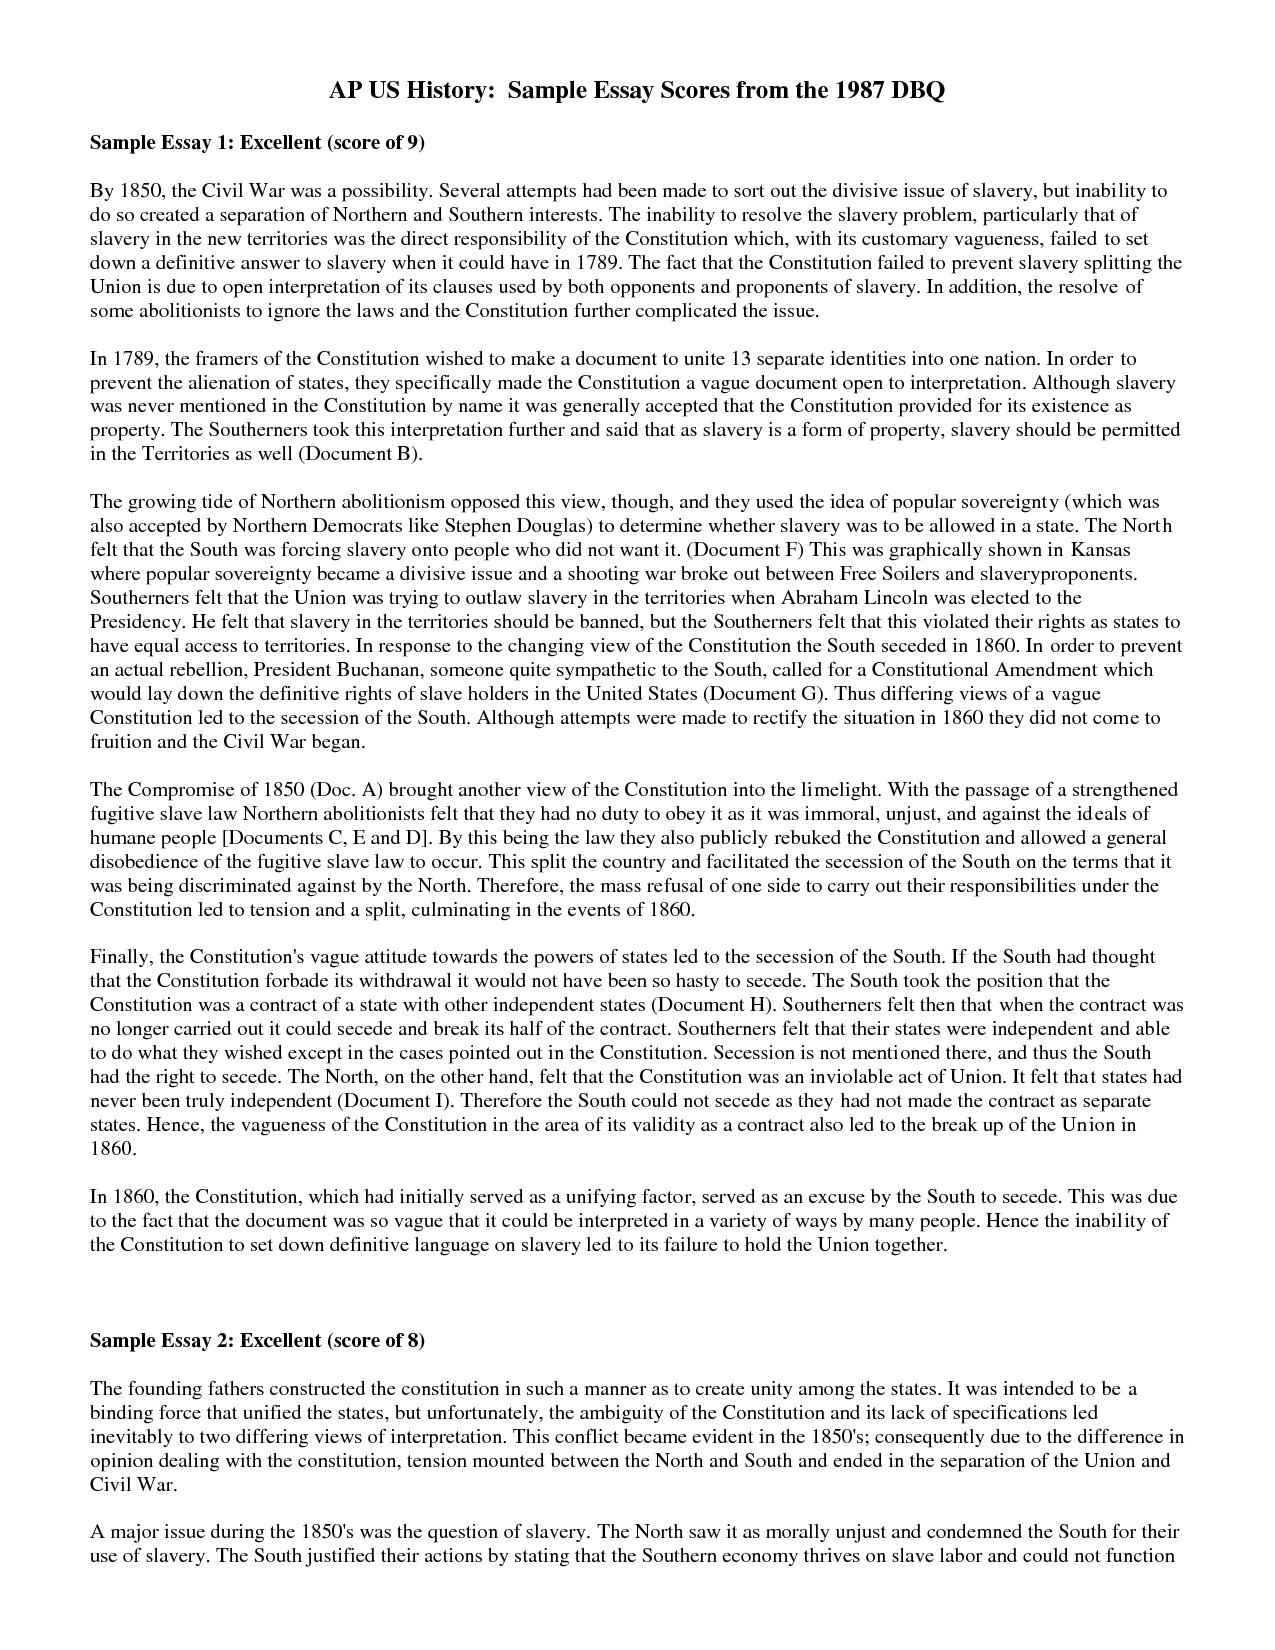 001 Ybw4oskdzu Essay Example What Is Unique History World Film Full